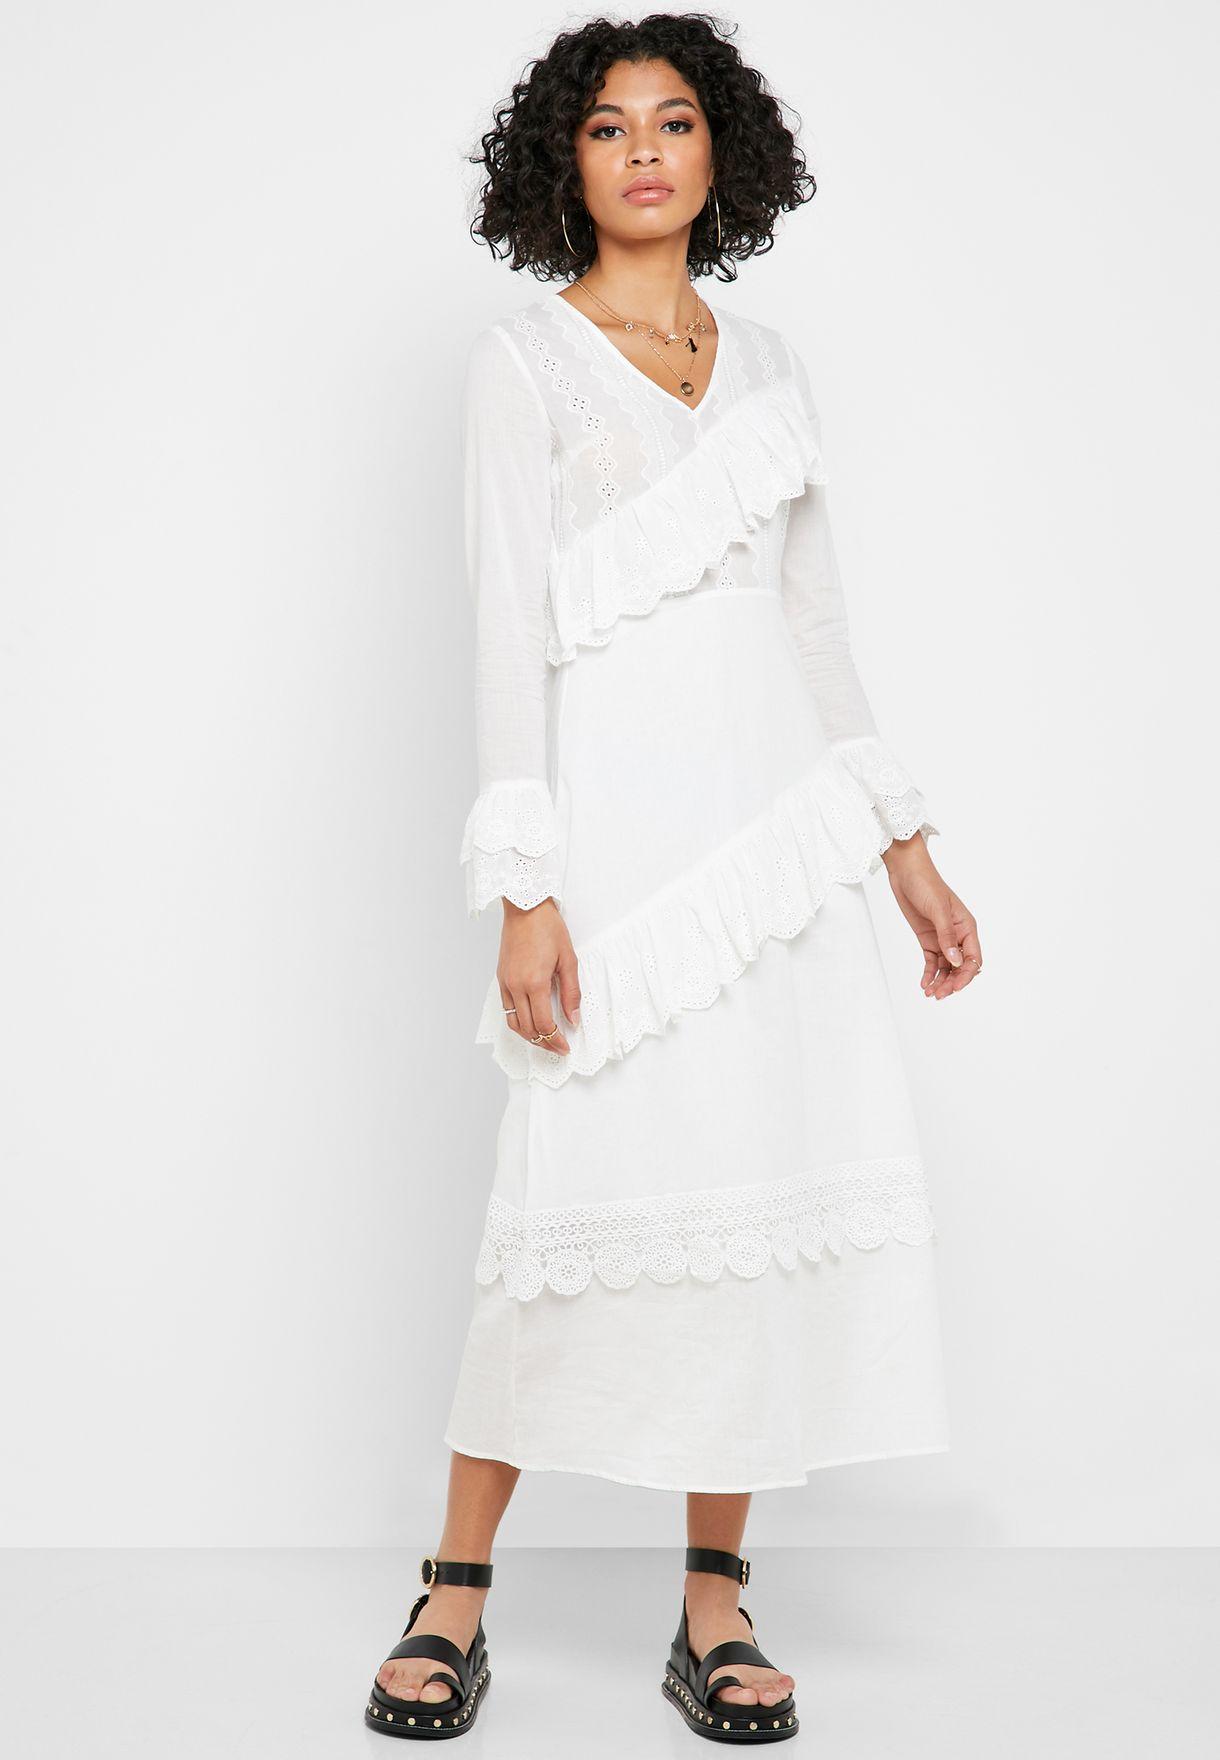 V-Neck Ruffle Detail Scallop Dress